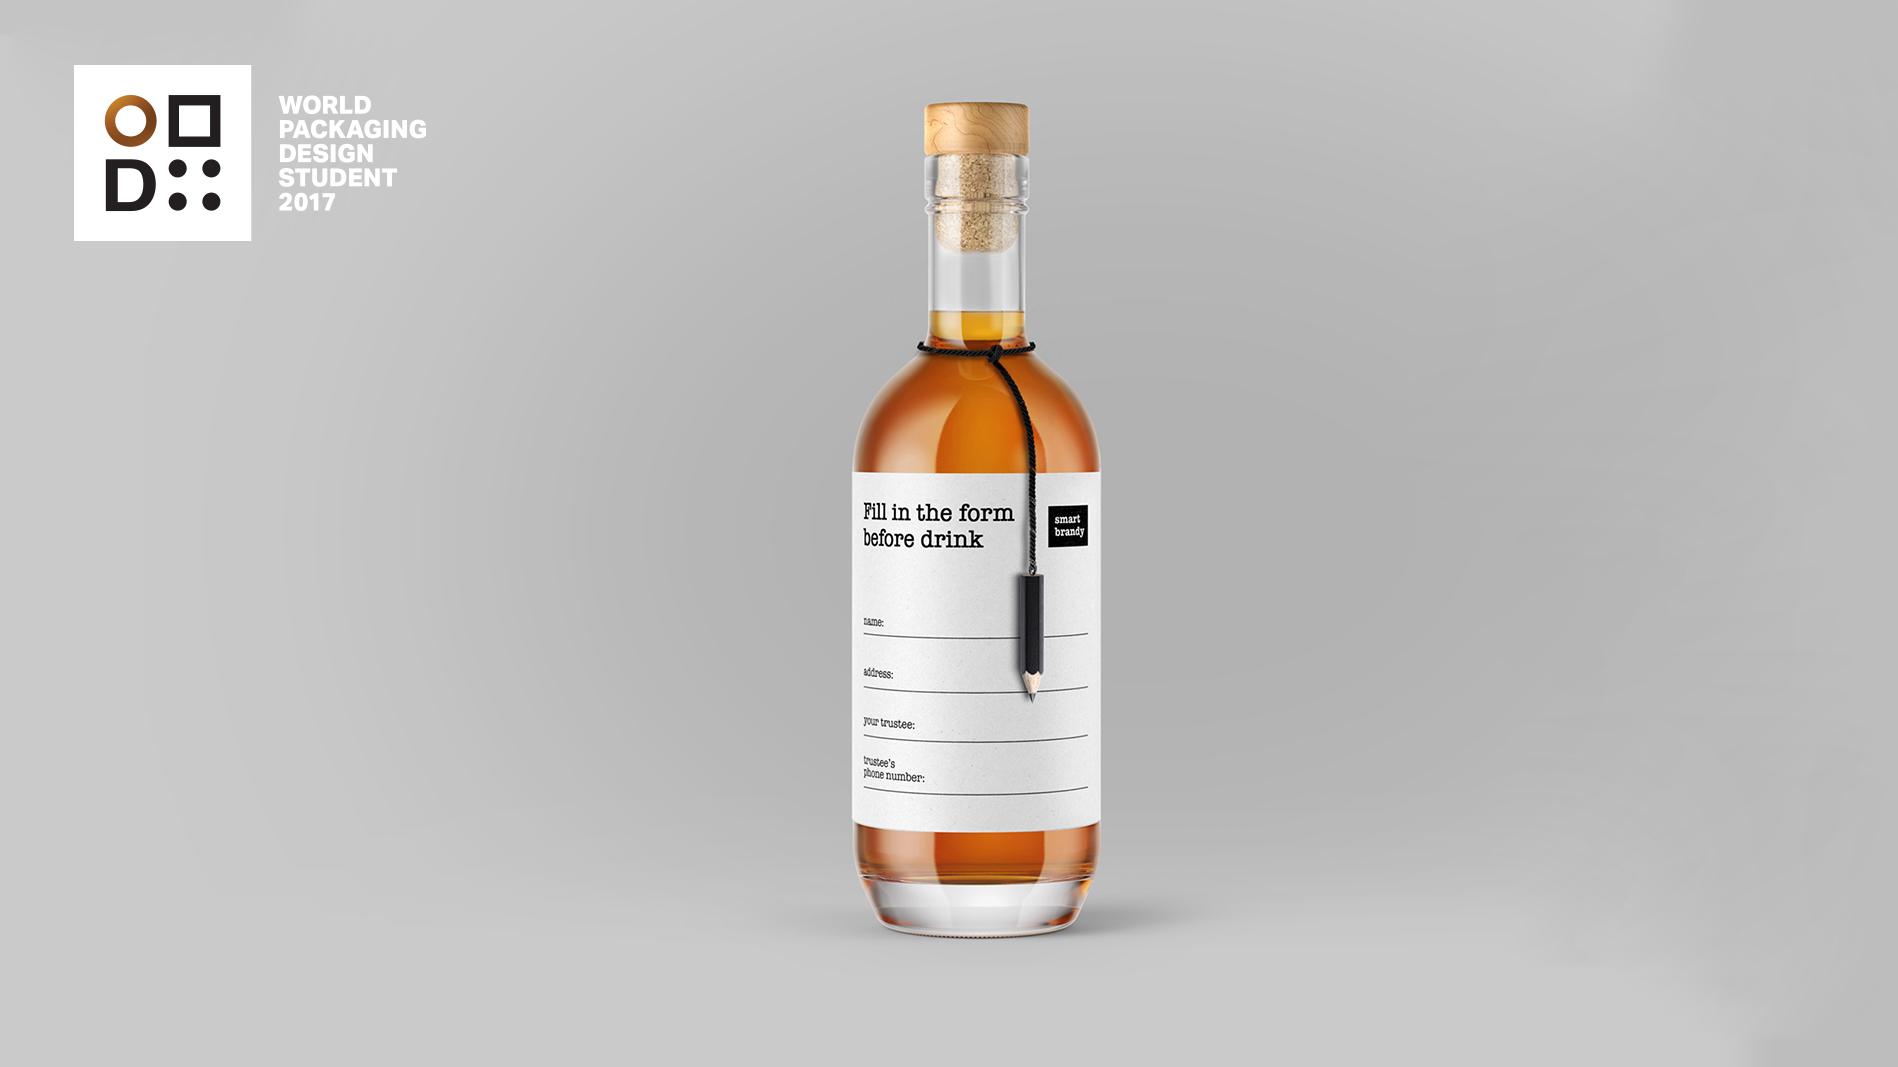 10-daria-kalenchuk-world-packaging-design-student.jpg